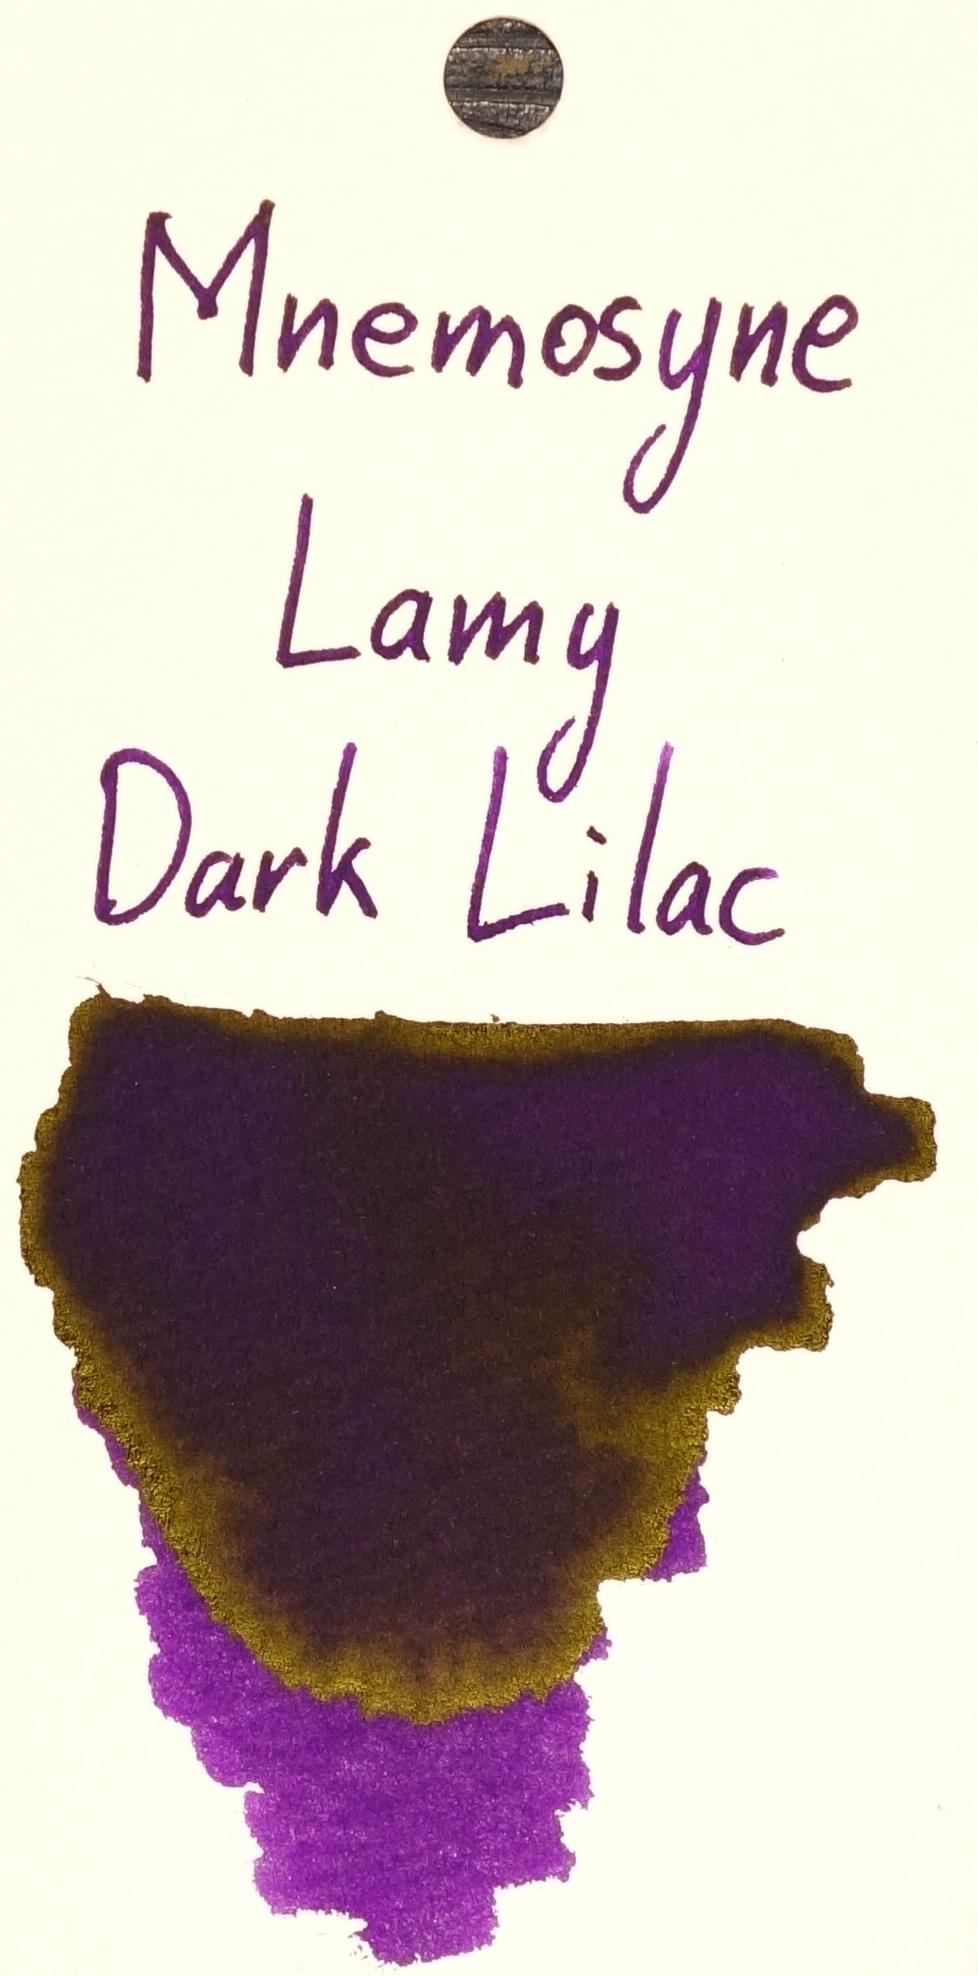 Lamy Dark Lilac Mnemosyne.JPG